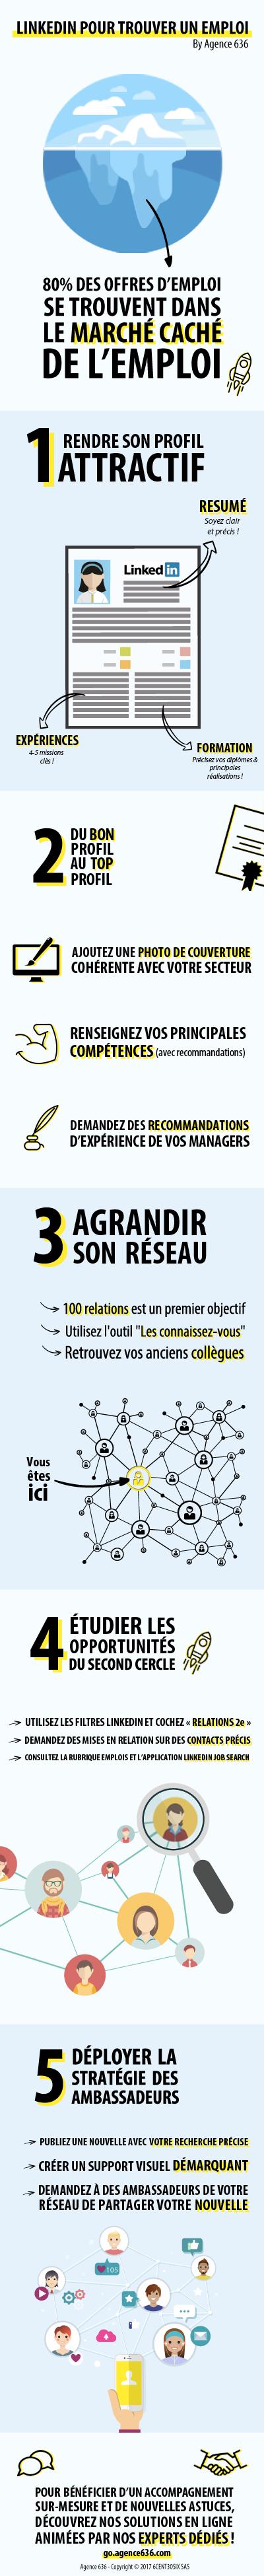 Agence636_LinkedIn_Emploi